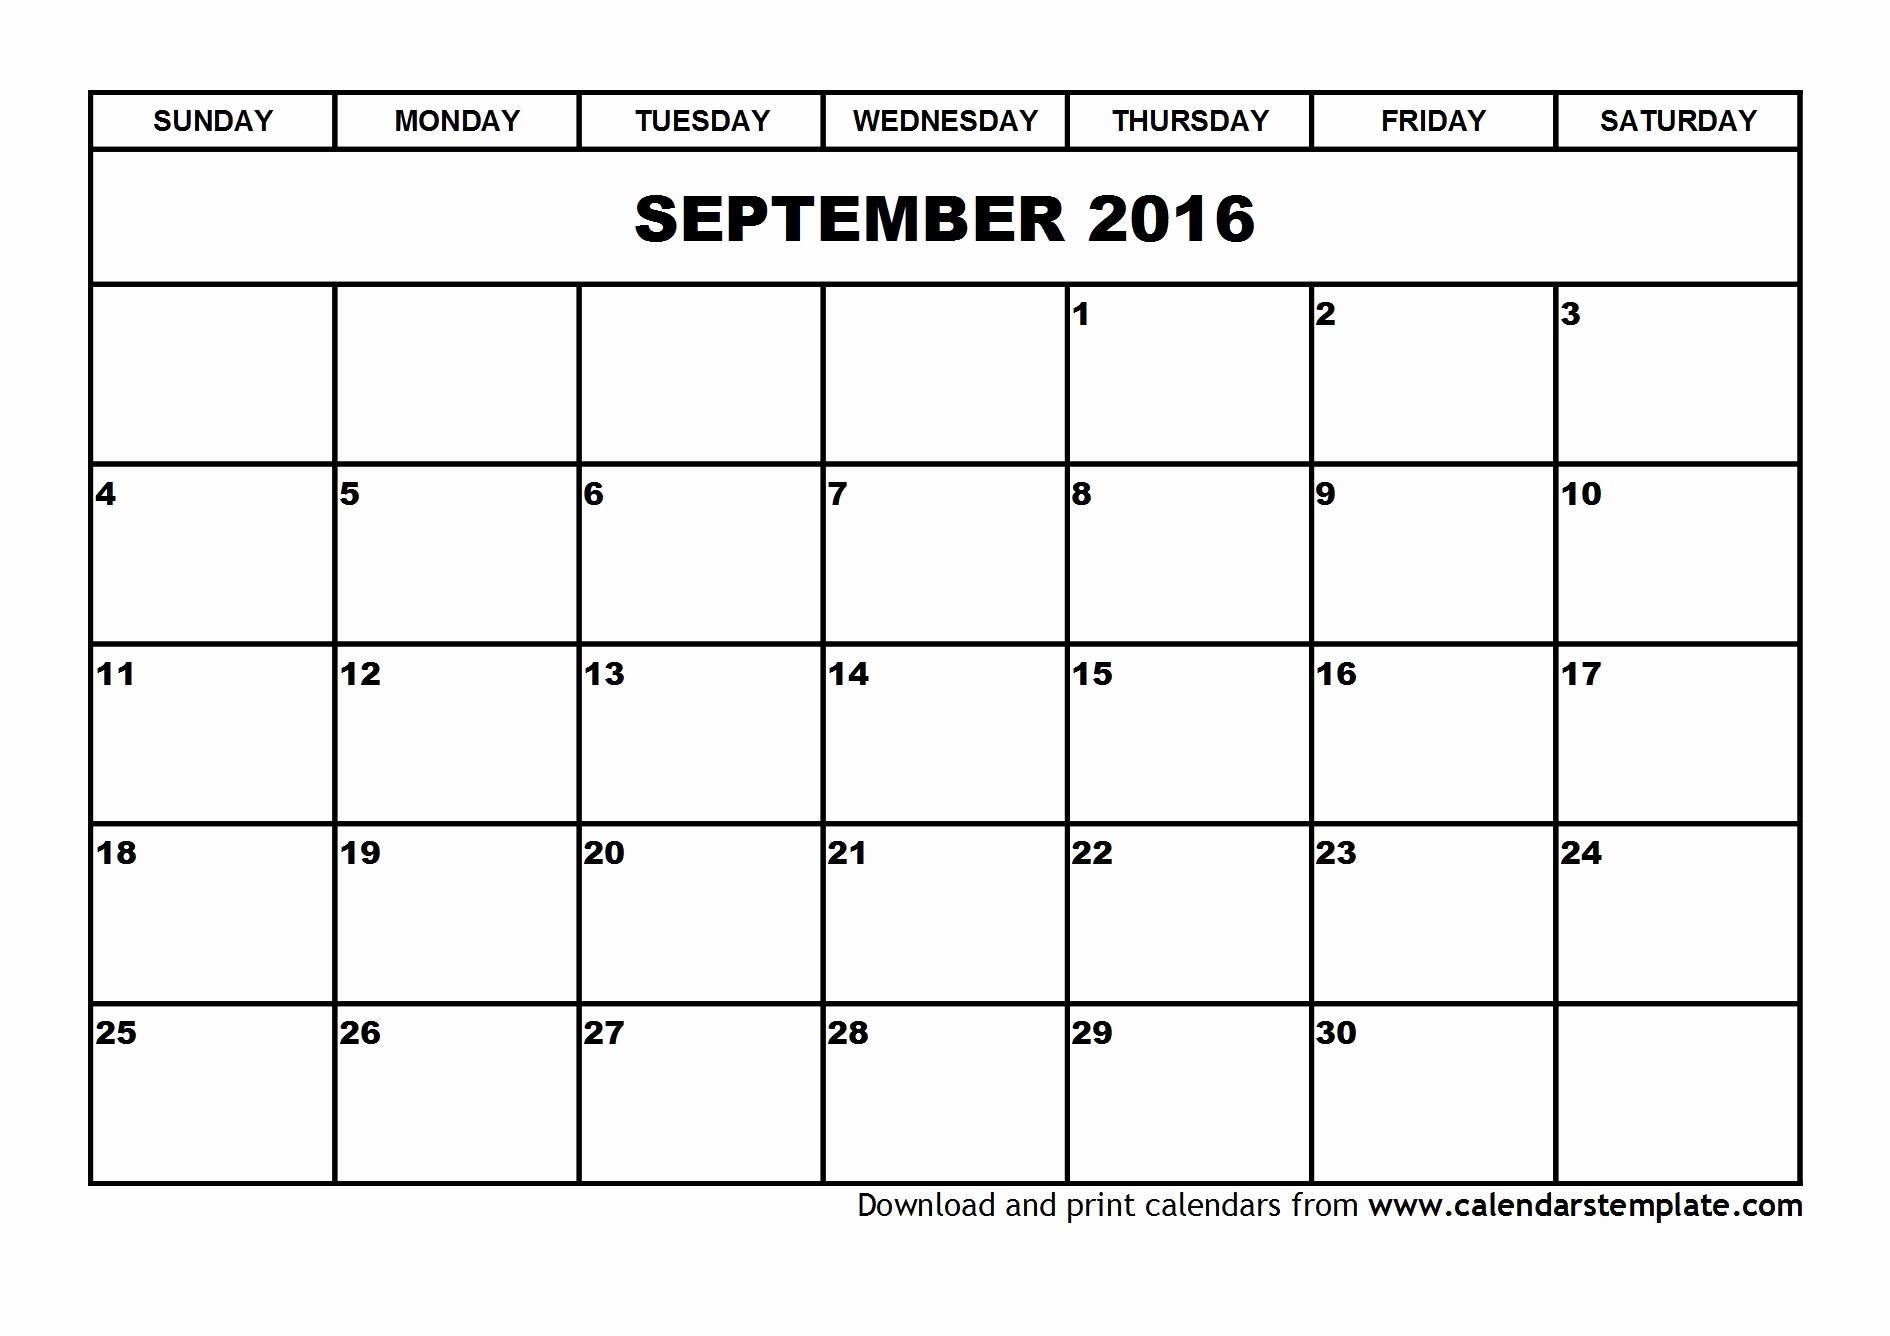 Free Printable Calendars 2016 Templates Best Of September 2016 Calendar Template